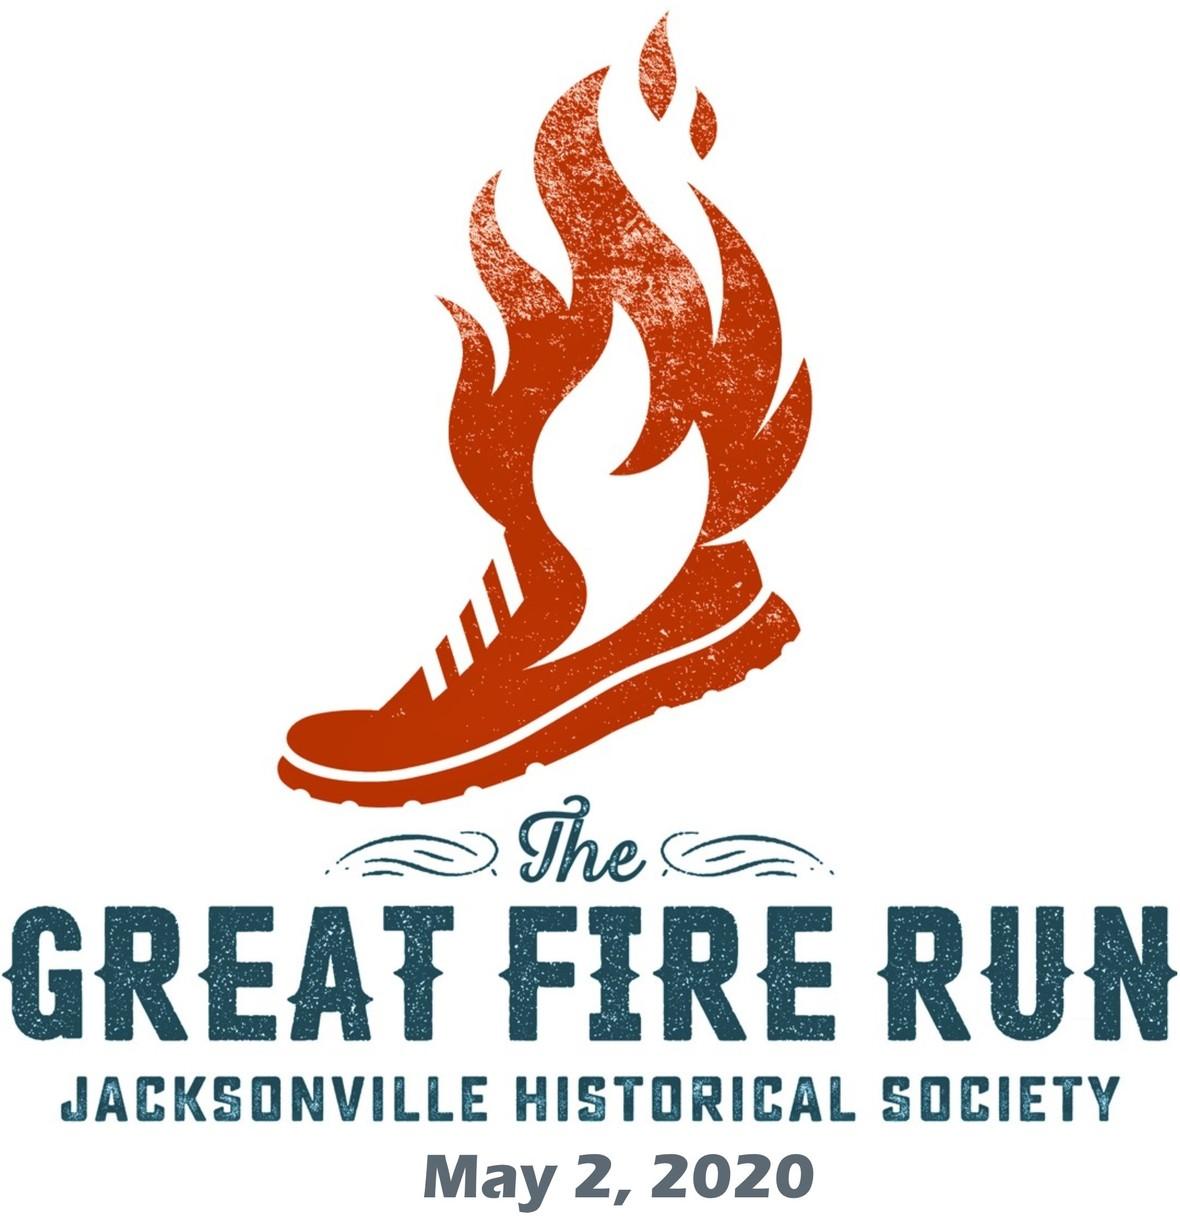 Fire Run logo with date